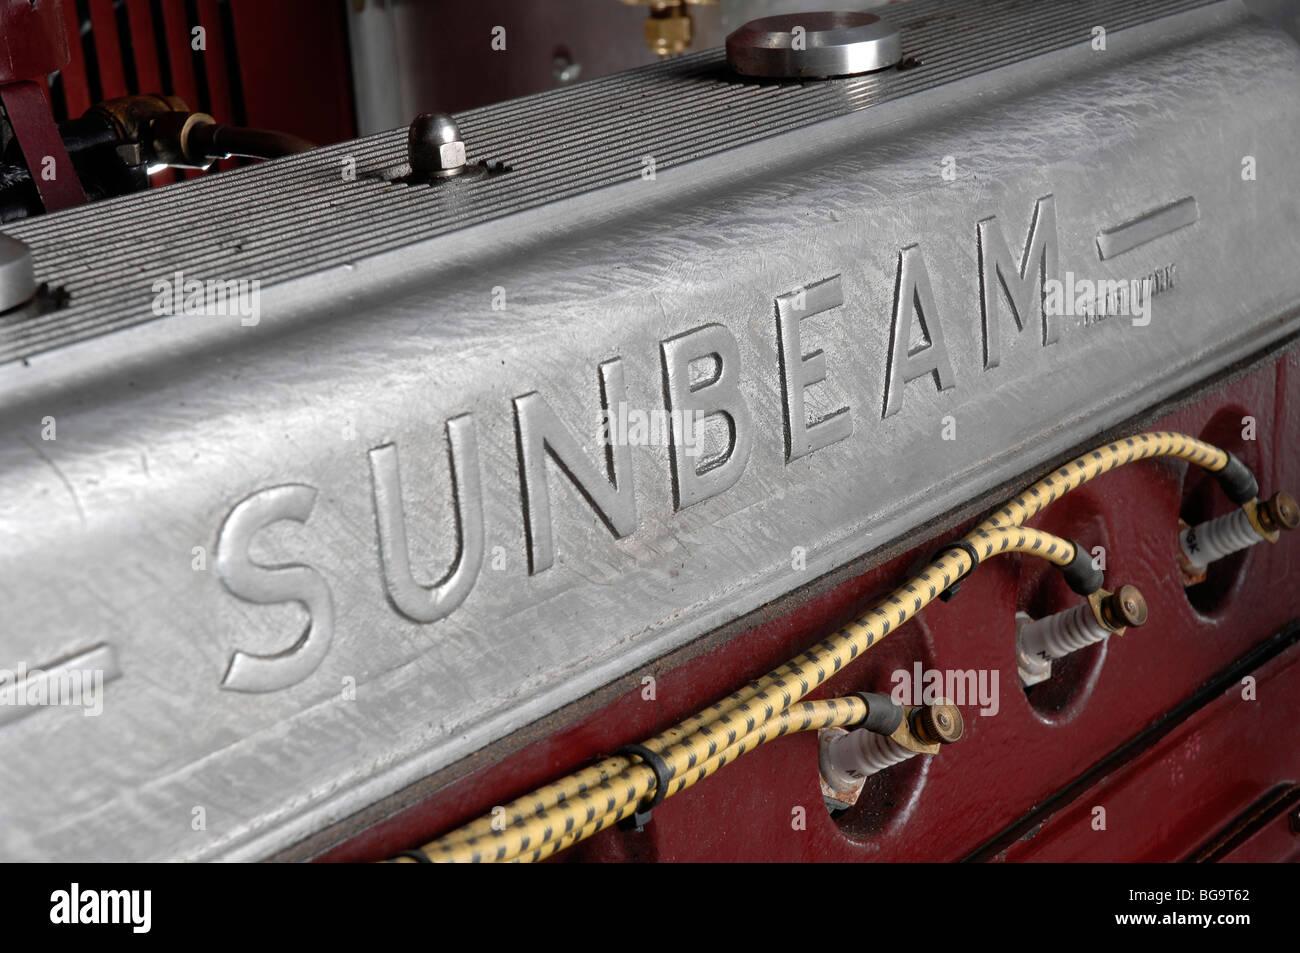 Sunbeam 23.8hp Tourer 1932 - Stock Image